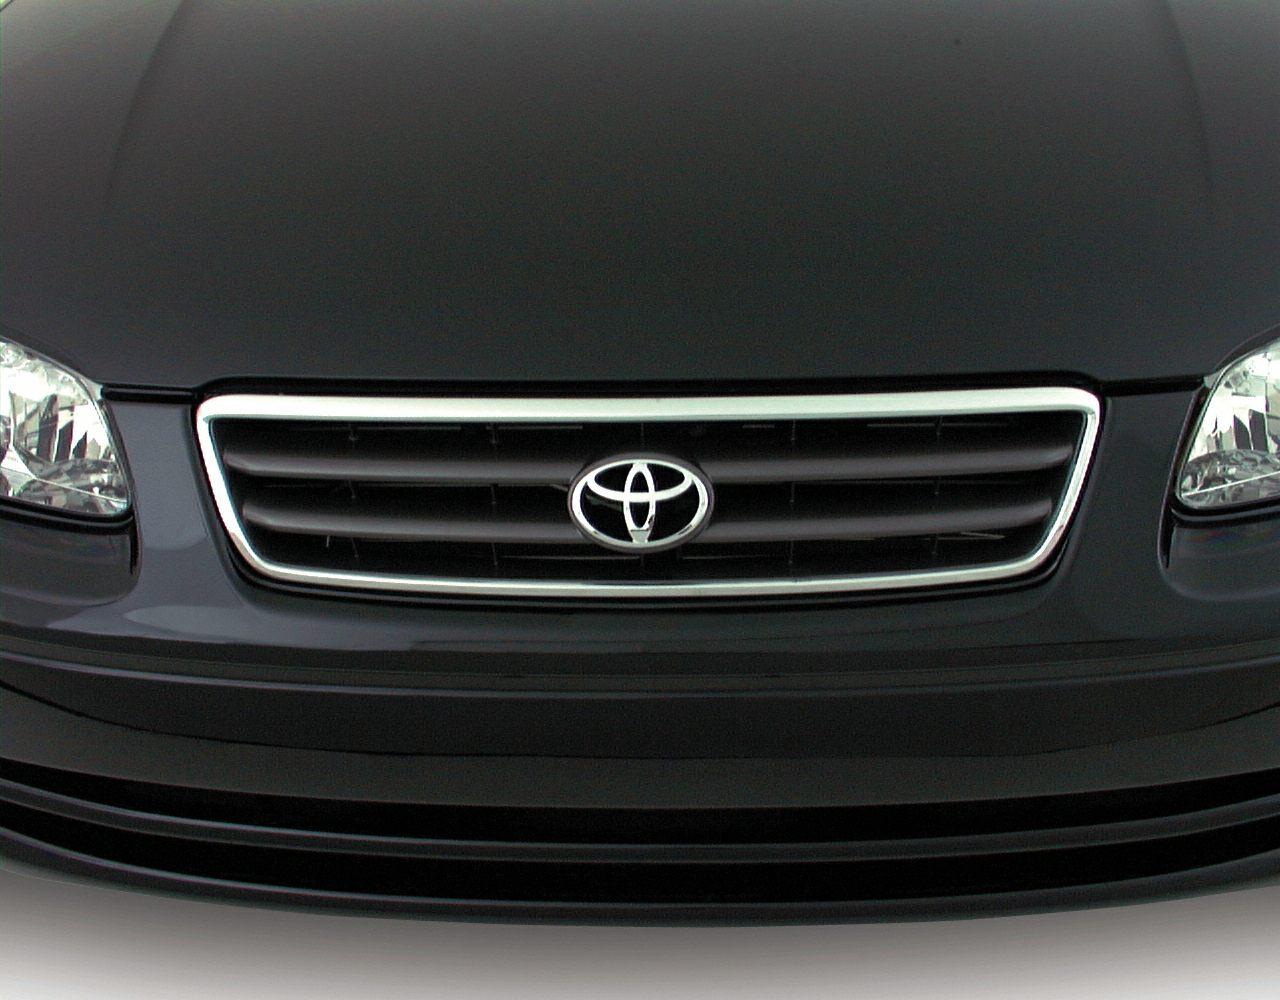 2000 Toyota Camry Exterior Photo